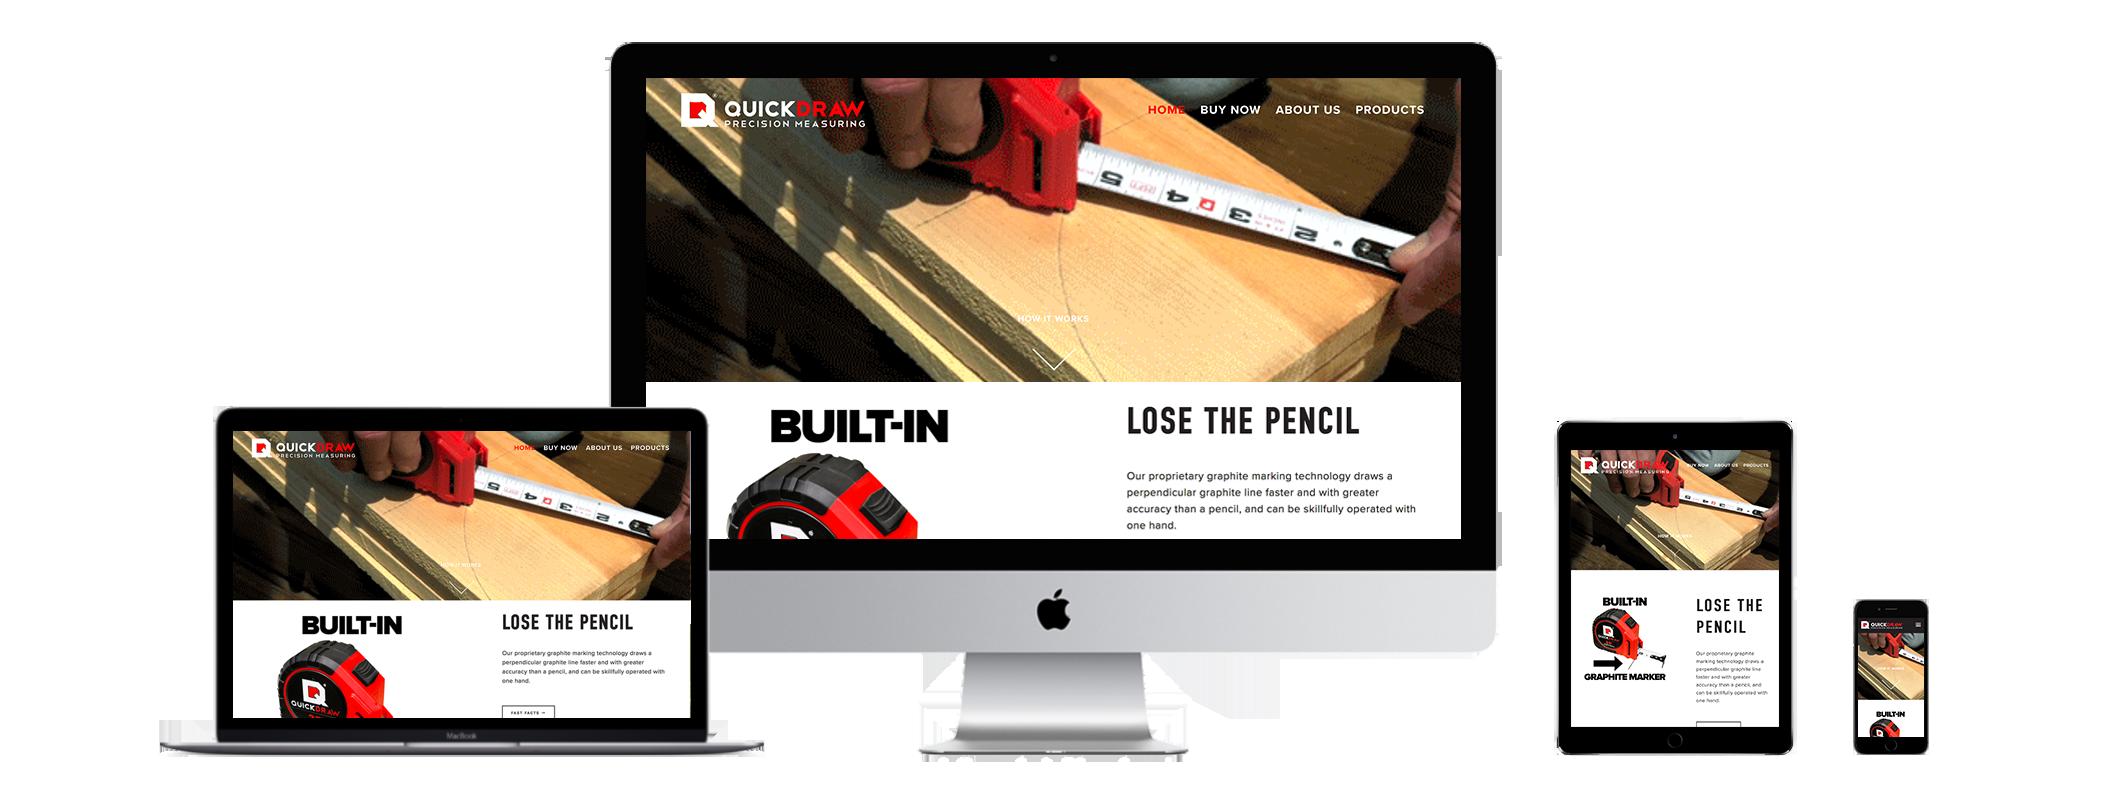 XYZ Design   QuickDraw Website Device Displays